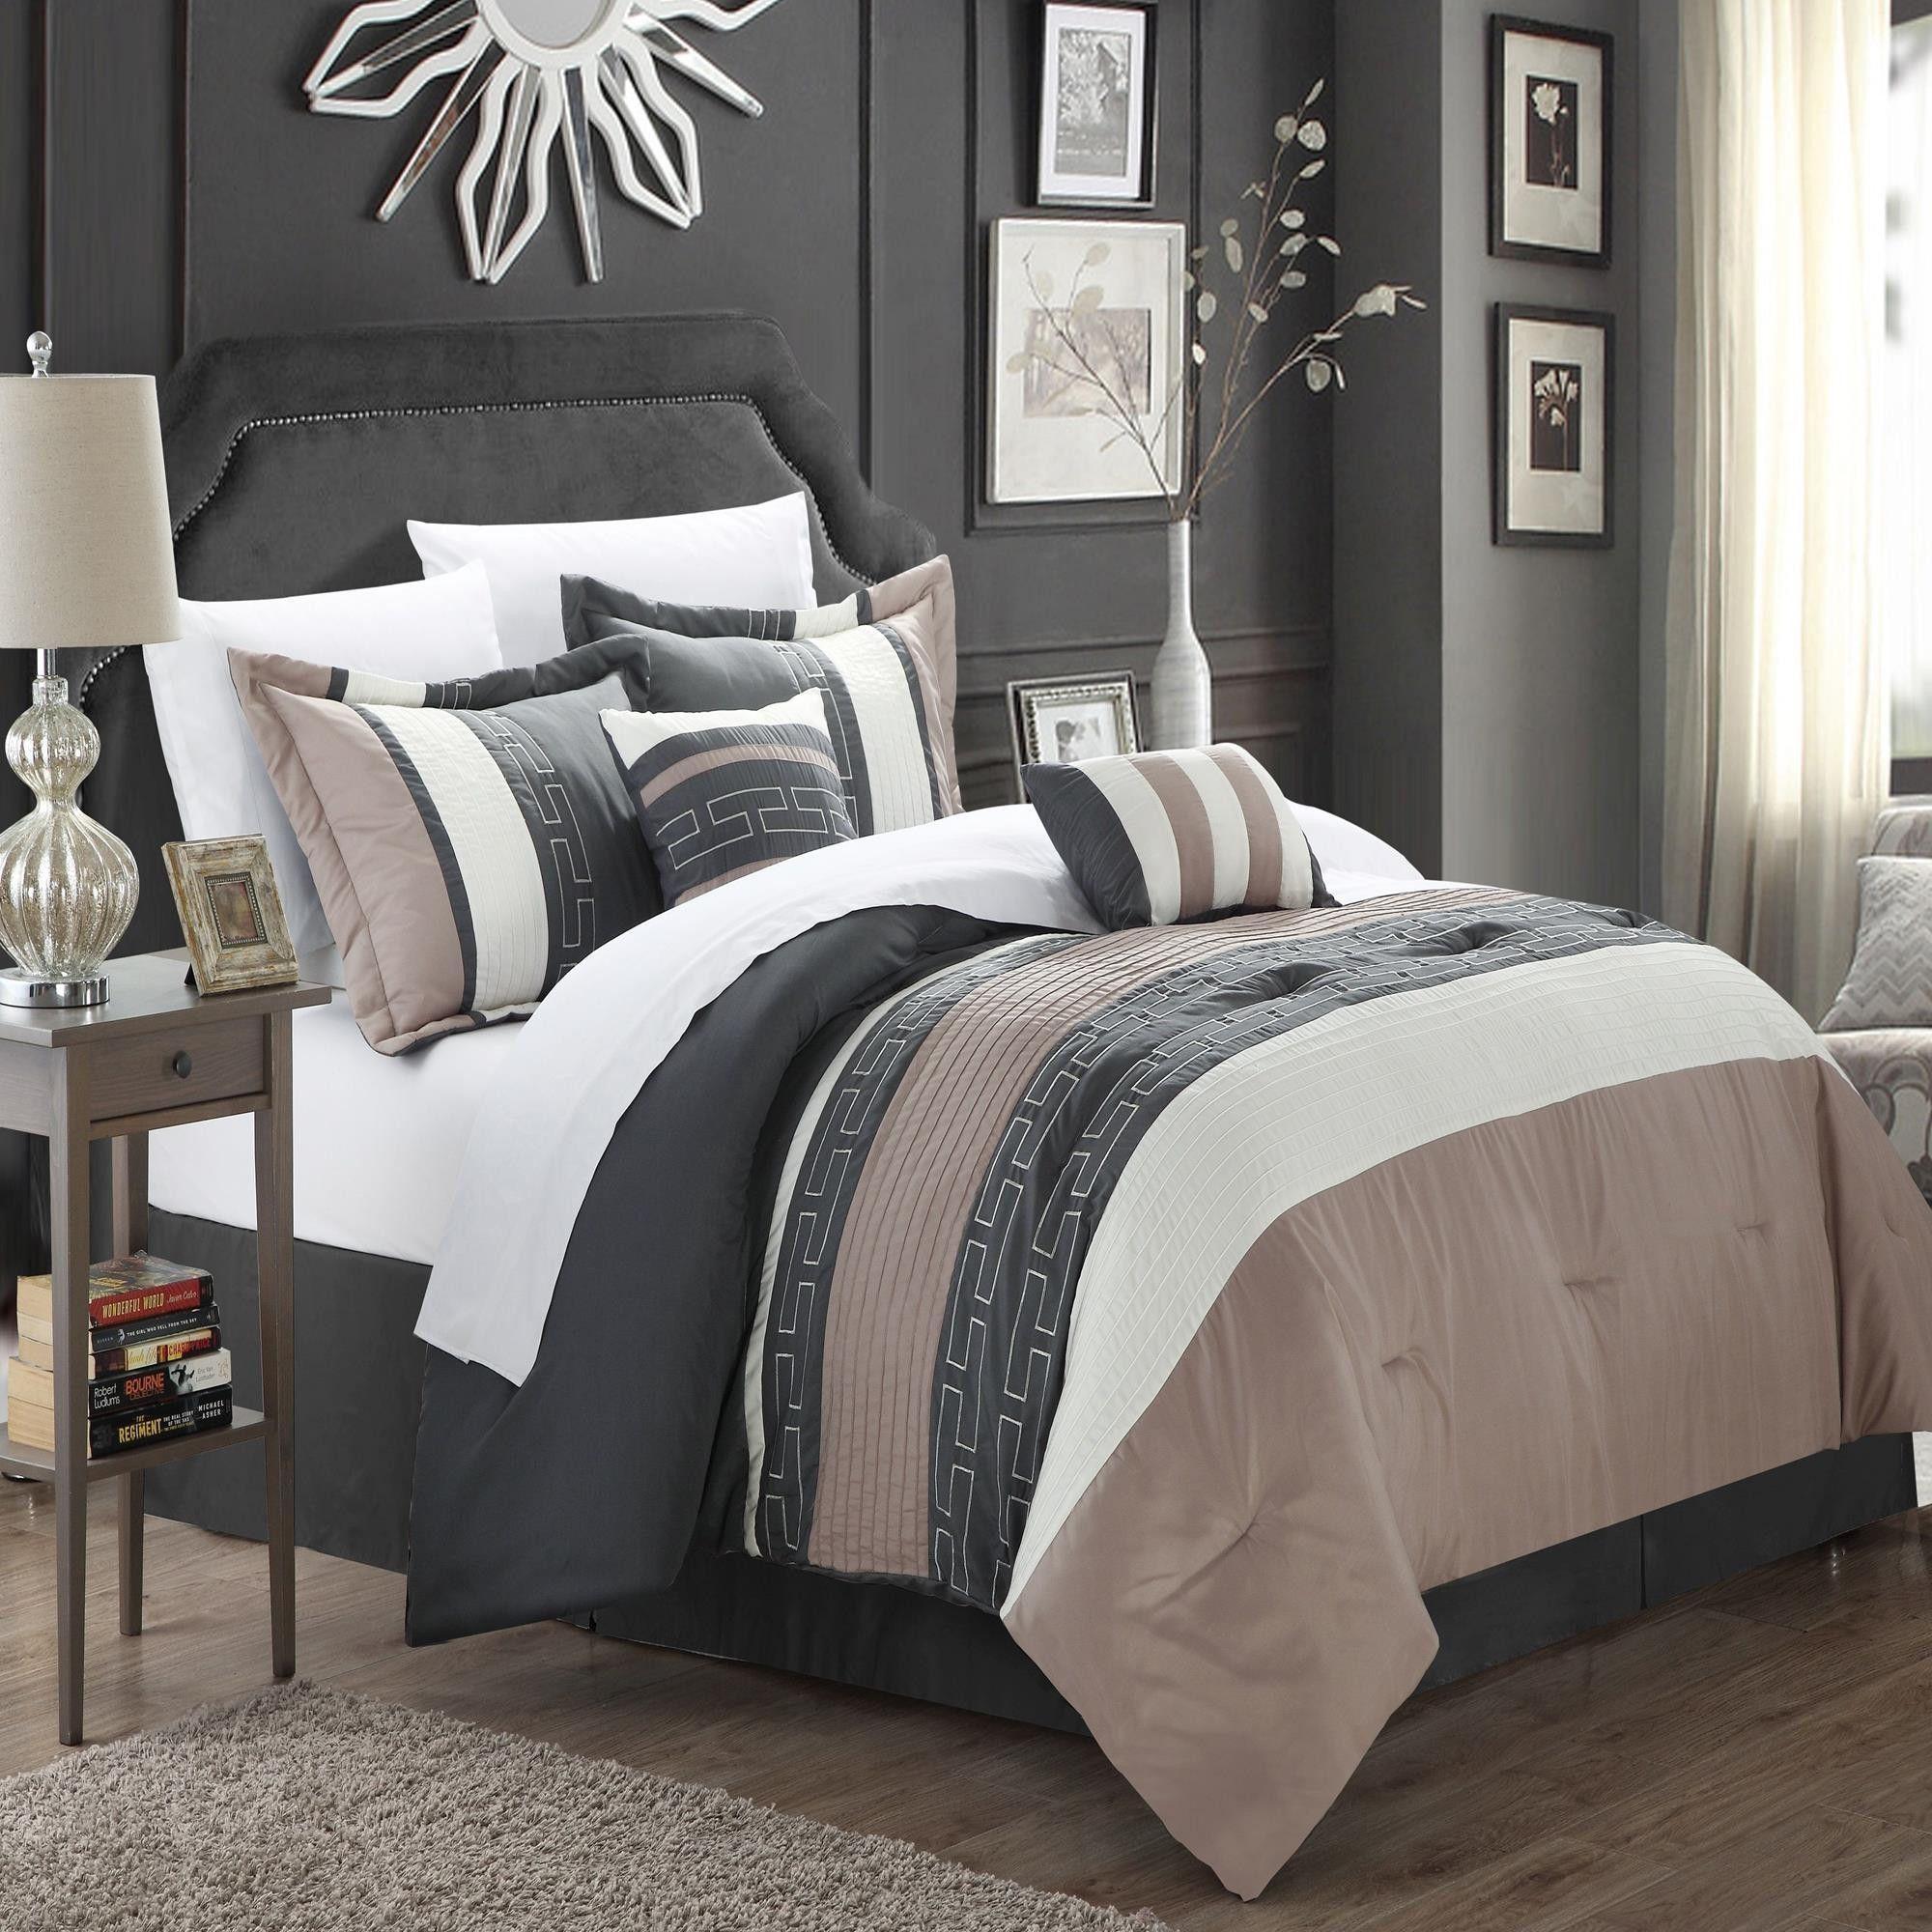 Carlton Taupe Grey Tan 6 Piece Comforter Bed In A Bag Set